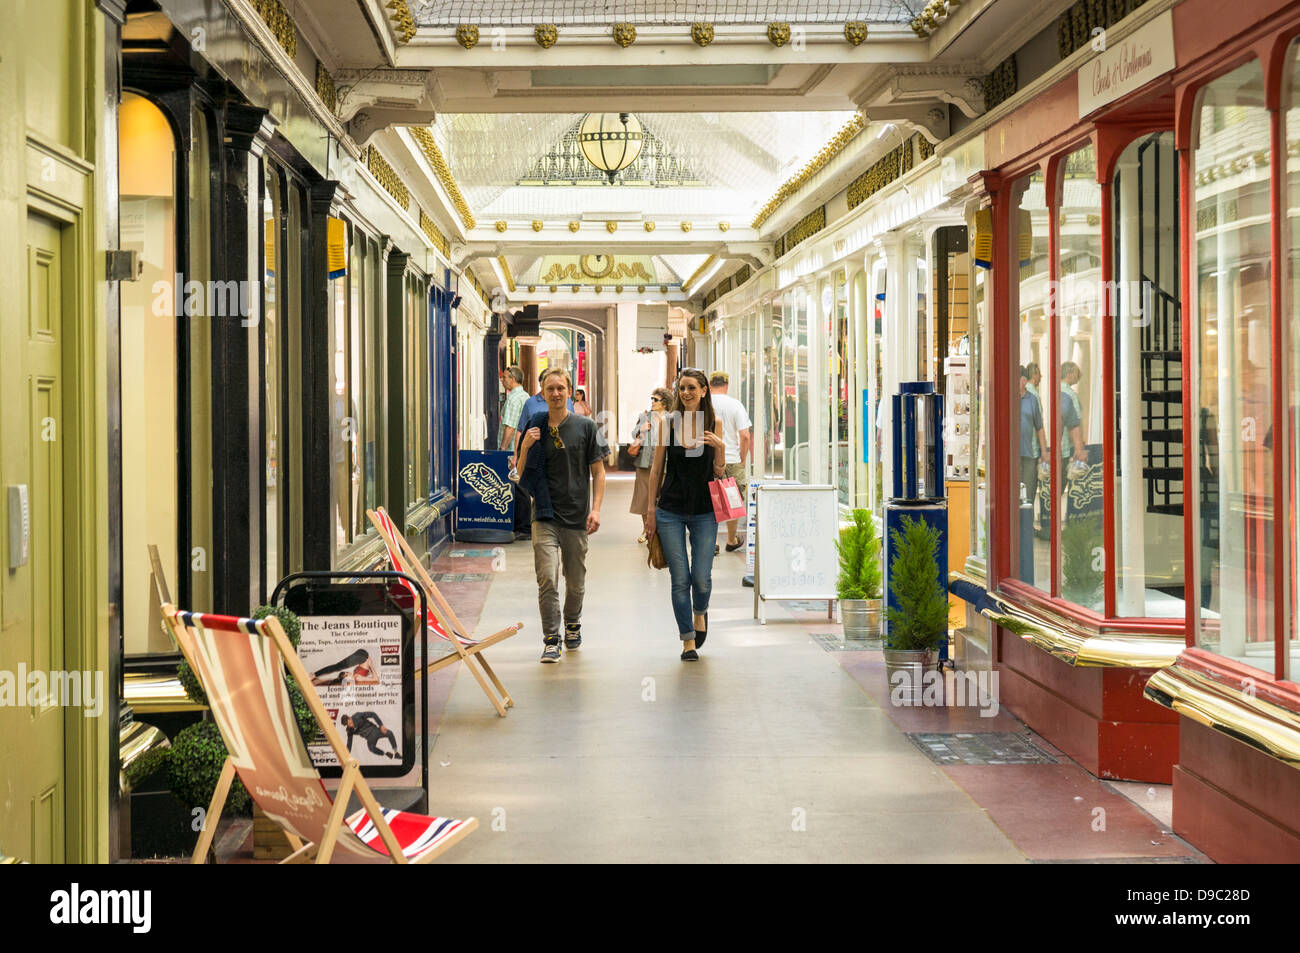 The Corridor Arcade in Bath, England, UK - Stock Image